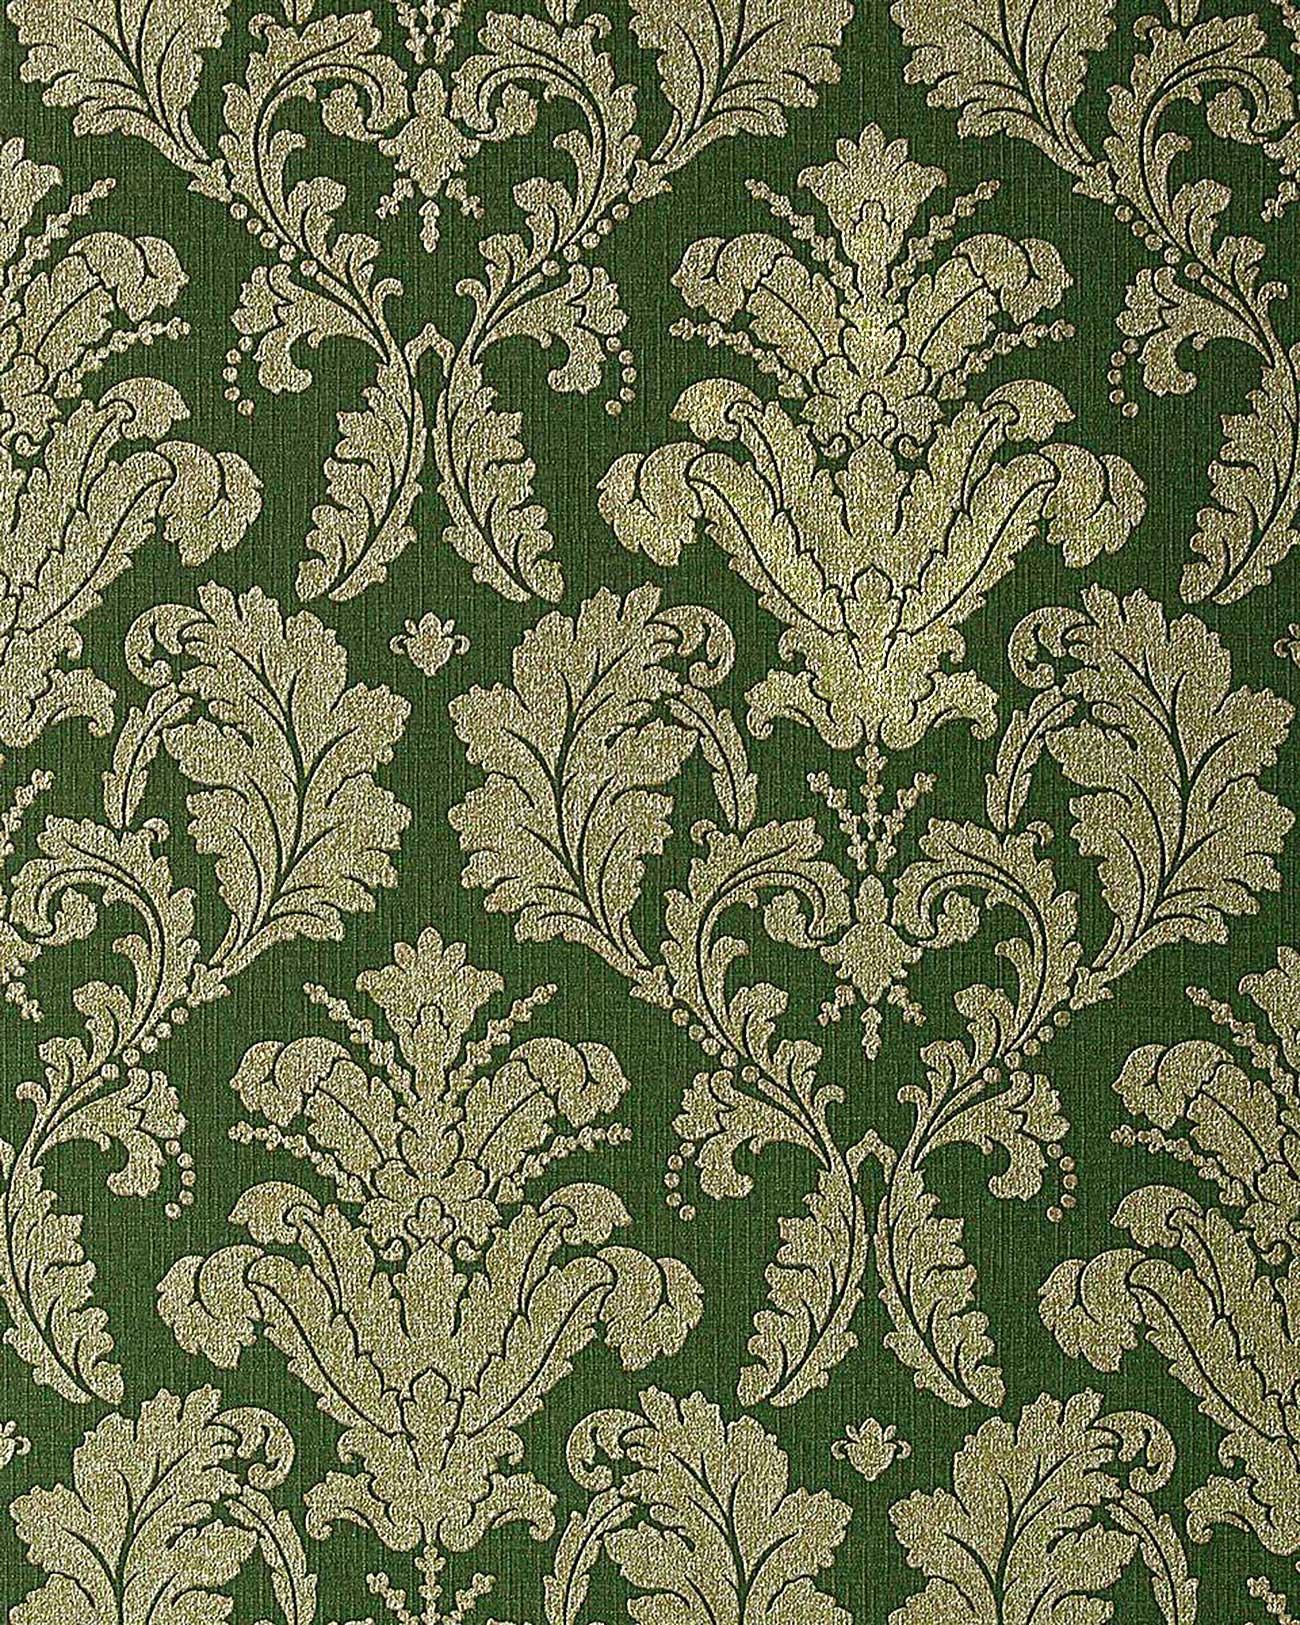 Englische Tapeten 3d barock tapete vintage edem 752 38 luxus neo klassik damask tapete